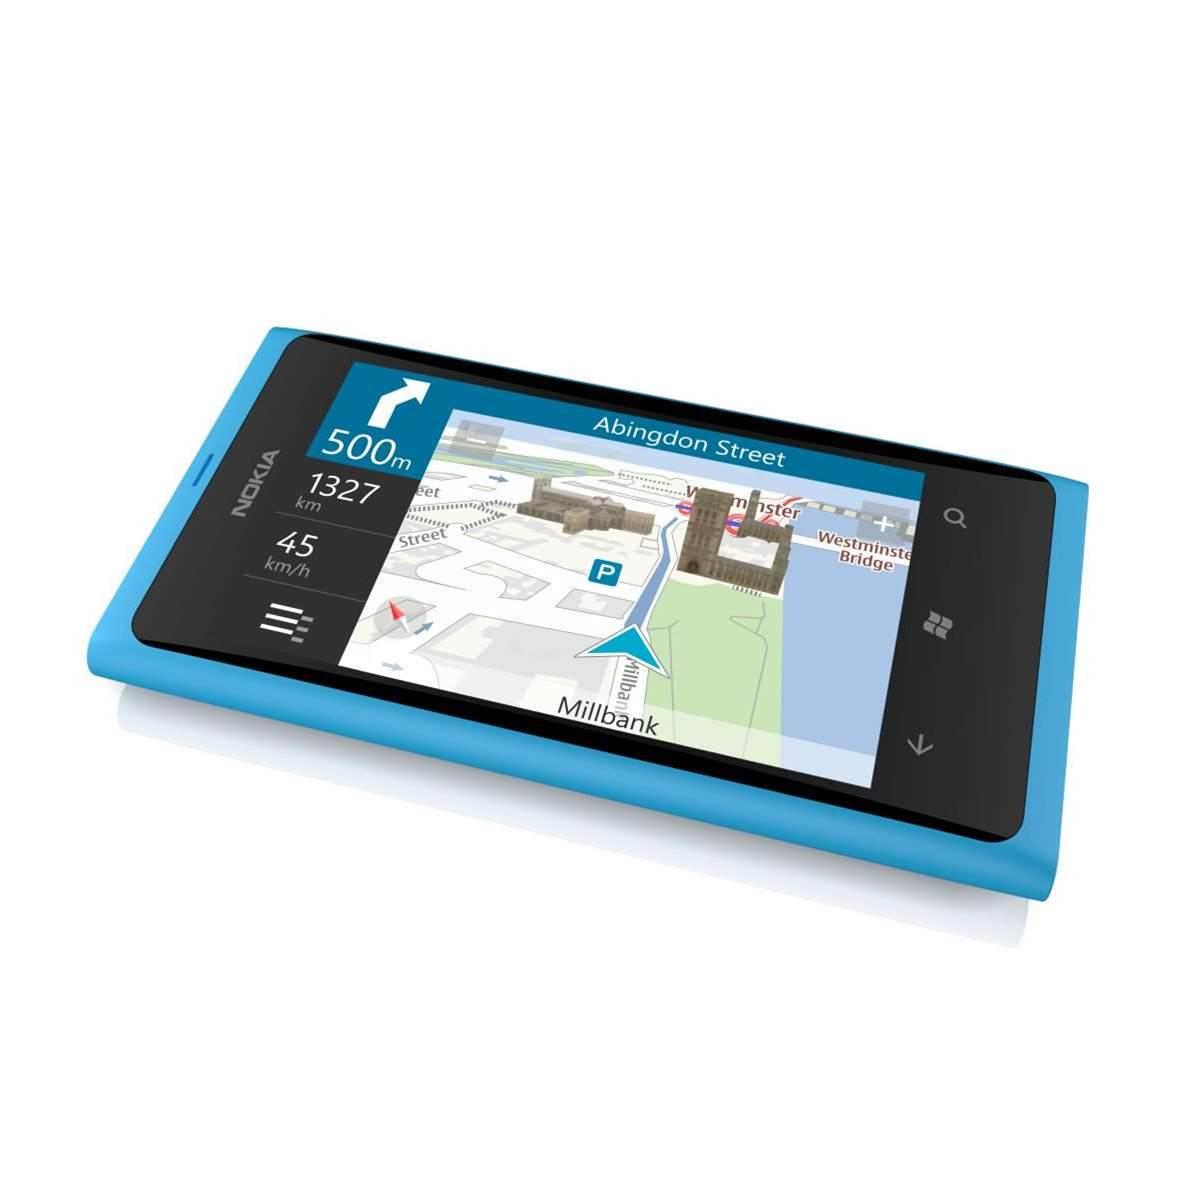 Did Windows Phone just solve its update problem?